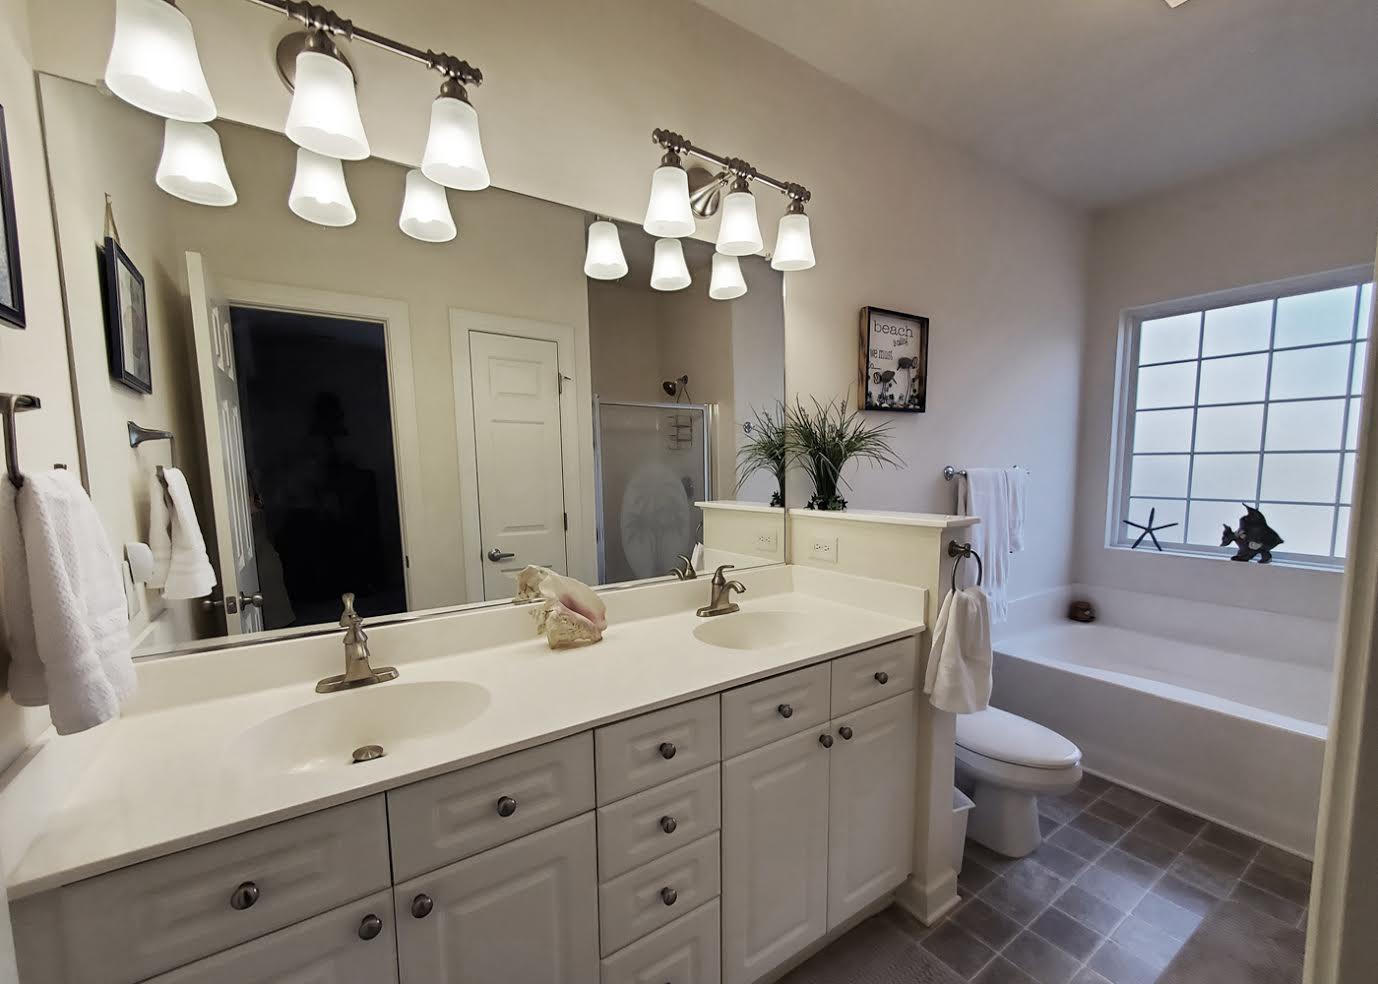 Grand Oaks Plantation Homes For Sale - 1607 Whitby, Charleston, SC - 4